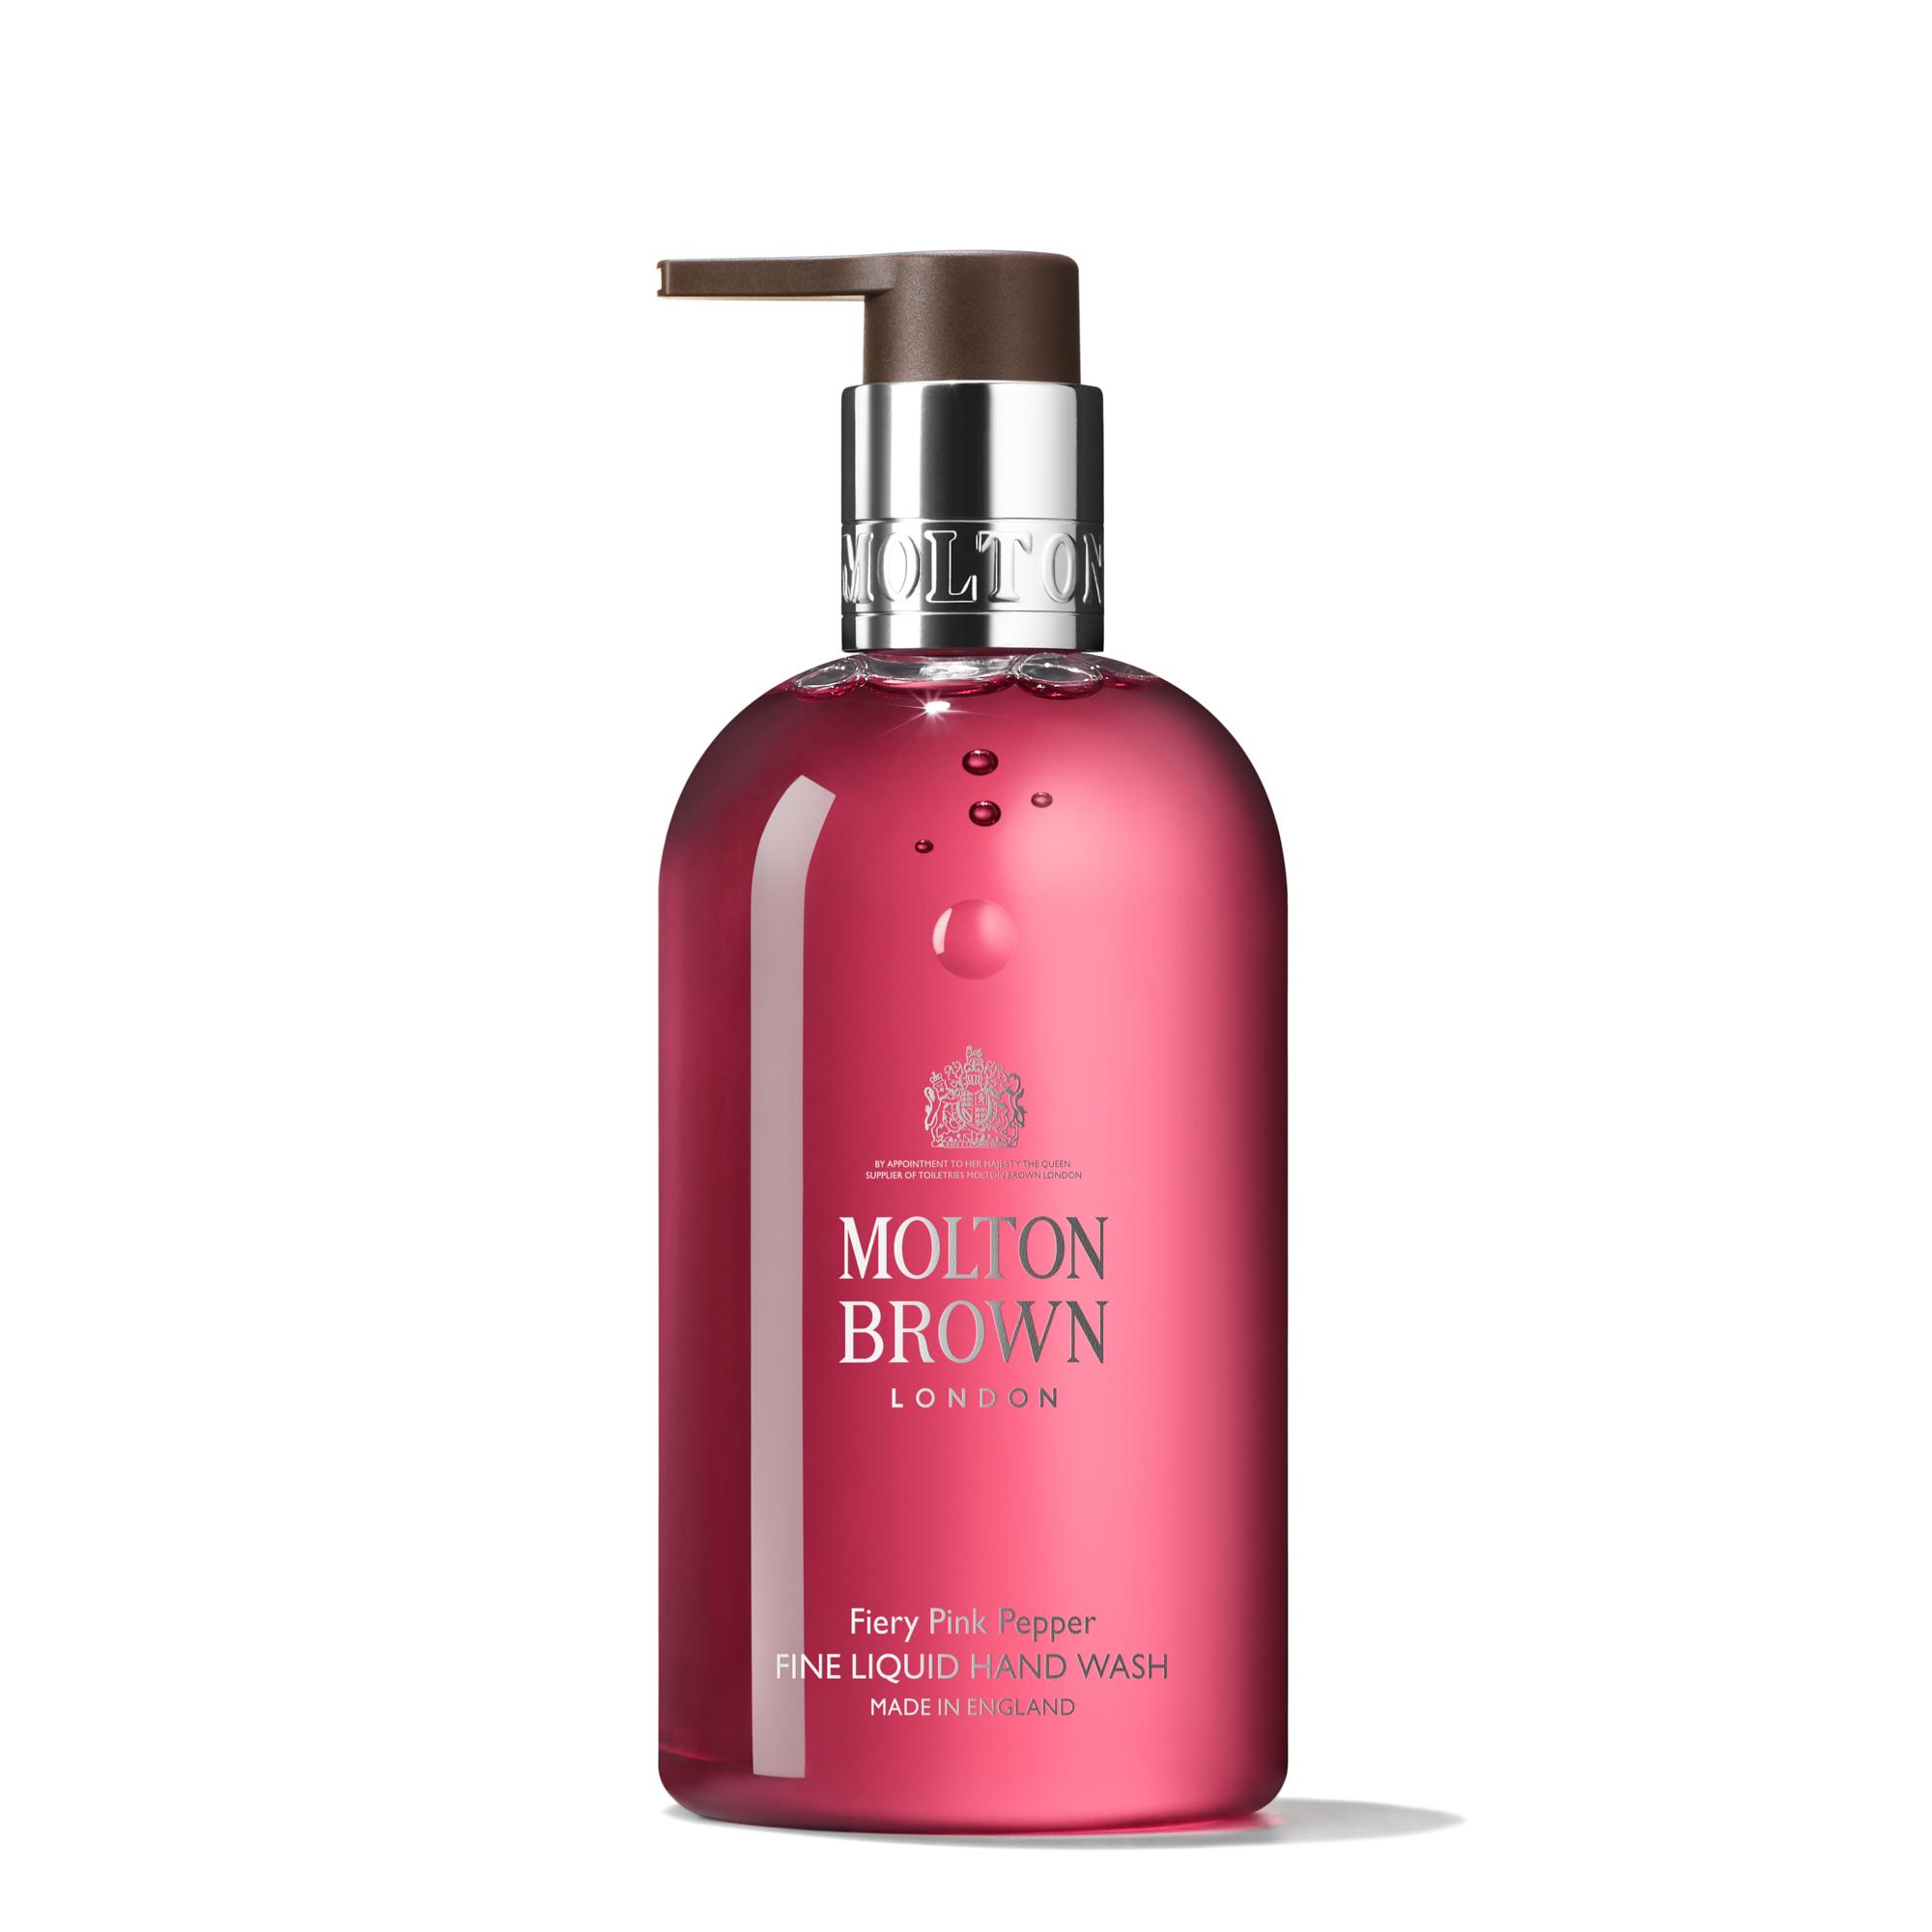 An image of Molton Brown Fiery Pink Pepper Fine Liquid Hand Wash 300ml - FIERY PINK PEPPER